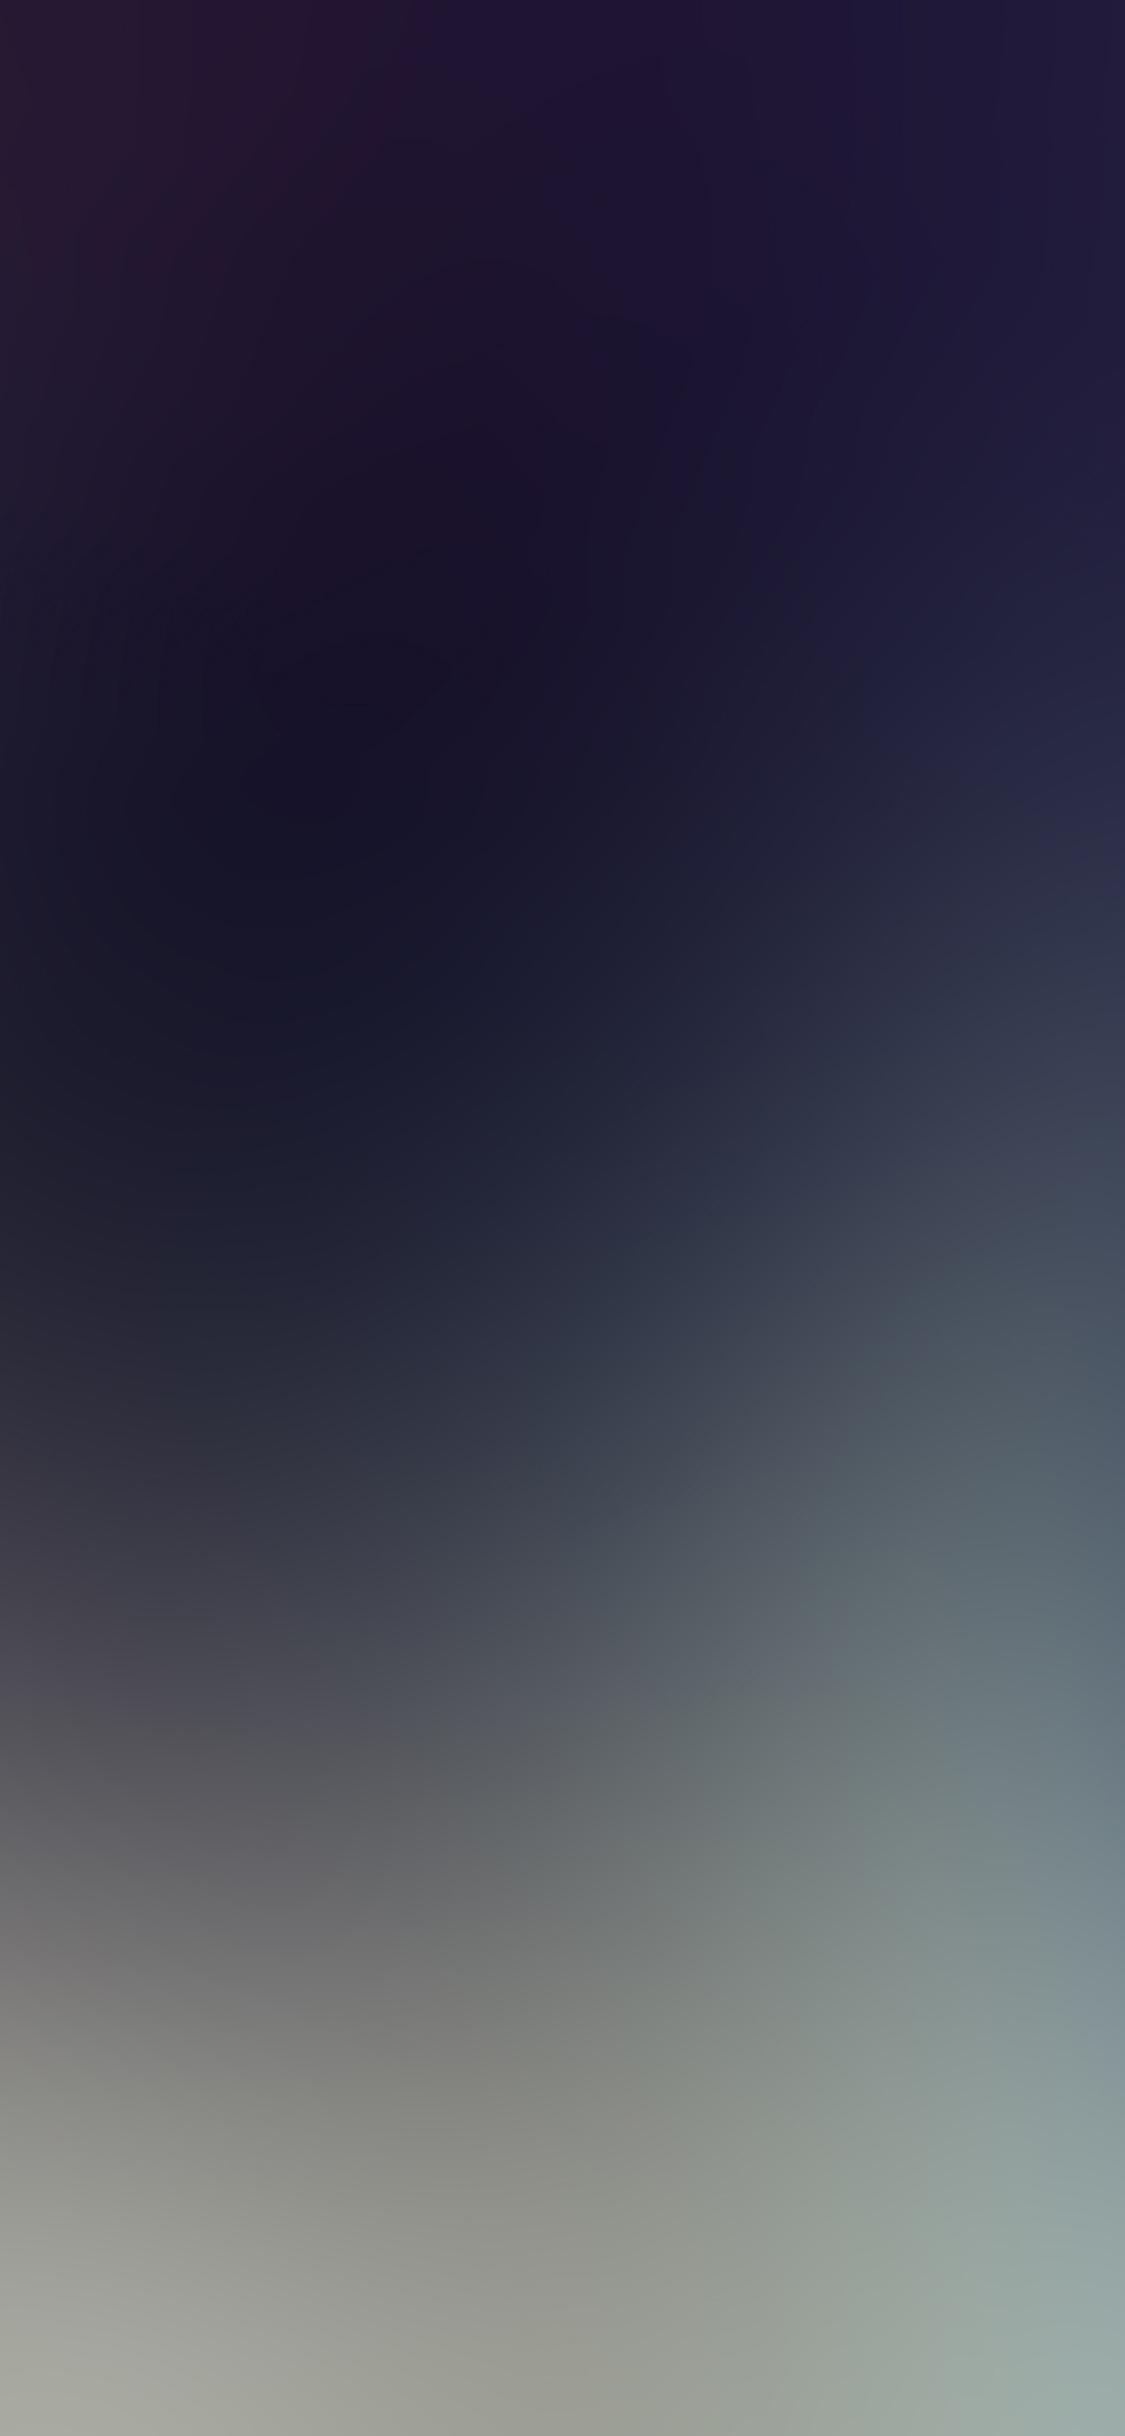 iPhoneXpapers.com-Apple-iPhone-wallpaper-sc16-blur-love-star-dark